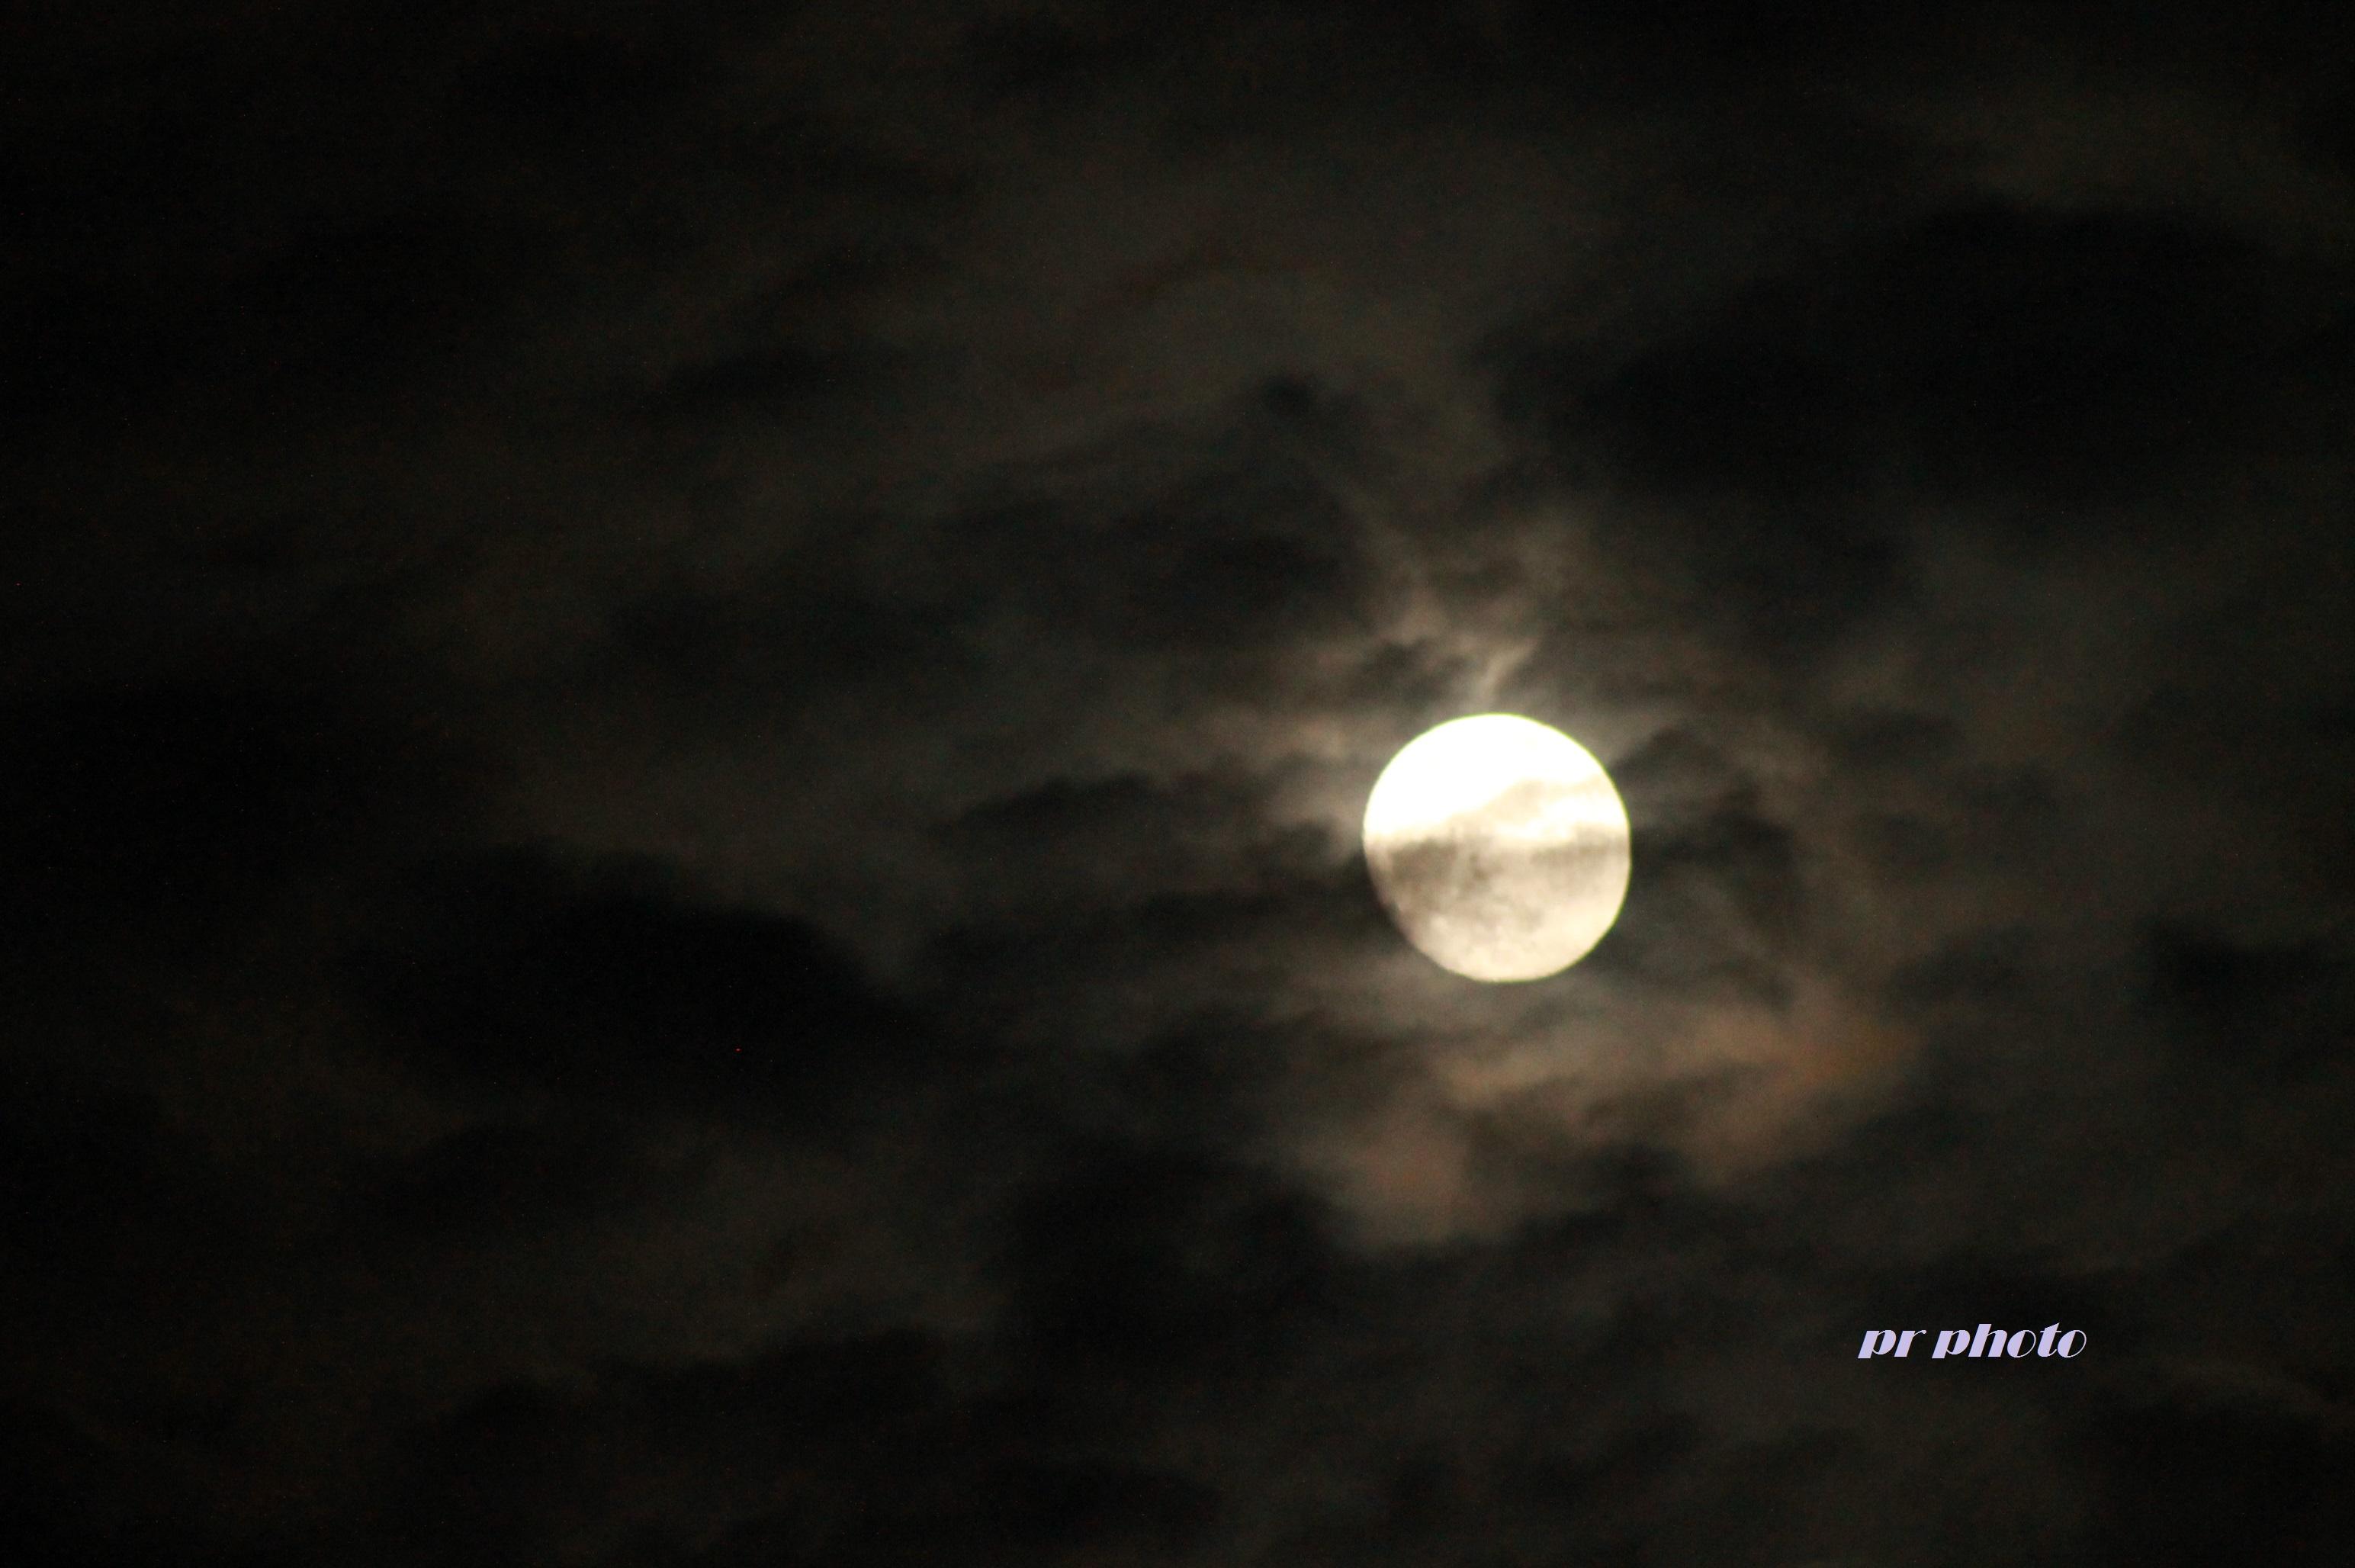 https://thoughtsandentanglements.files.wordpress.com/2014/01/my-first-moon-shot.jpg